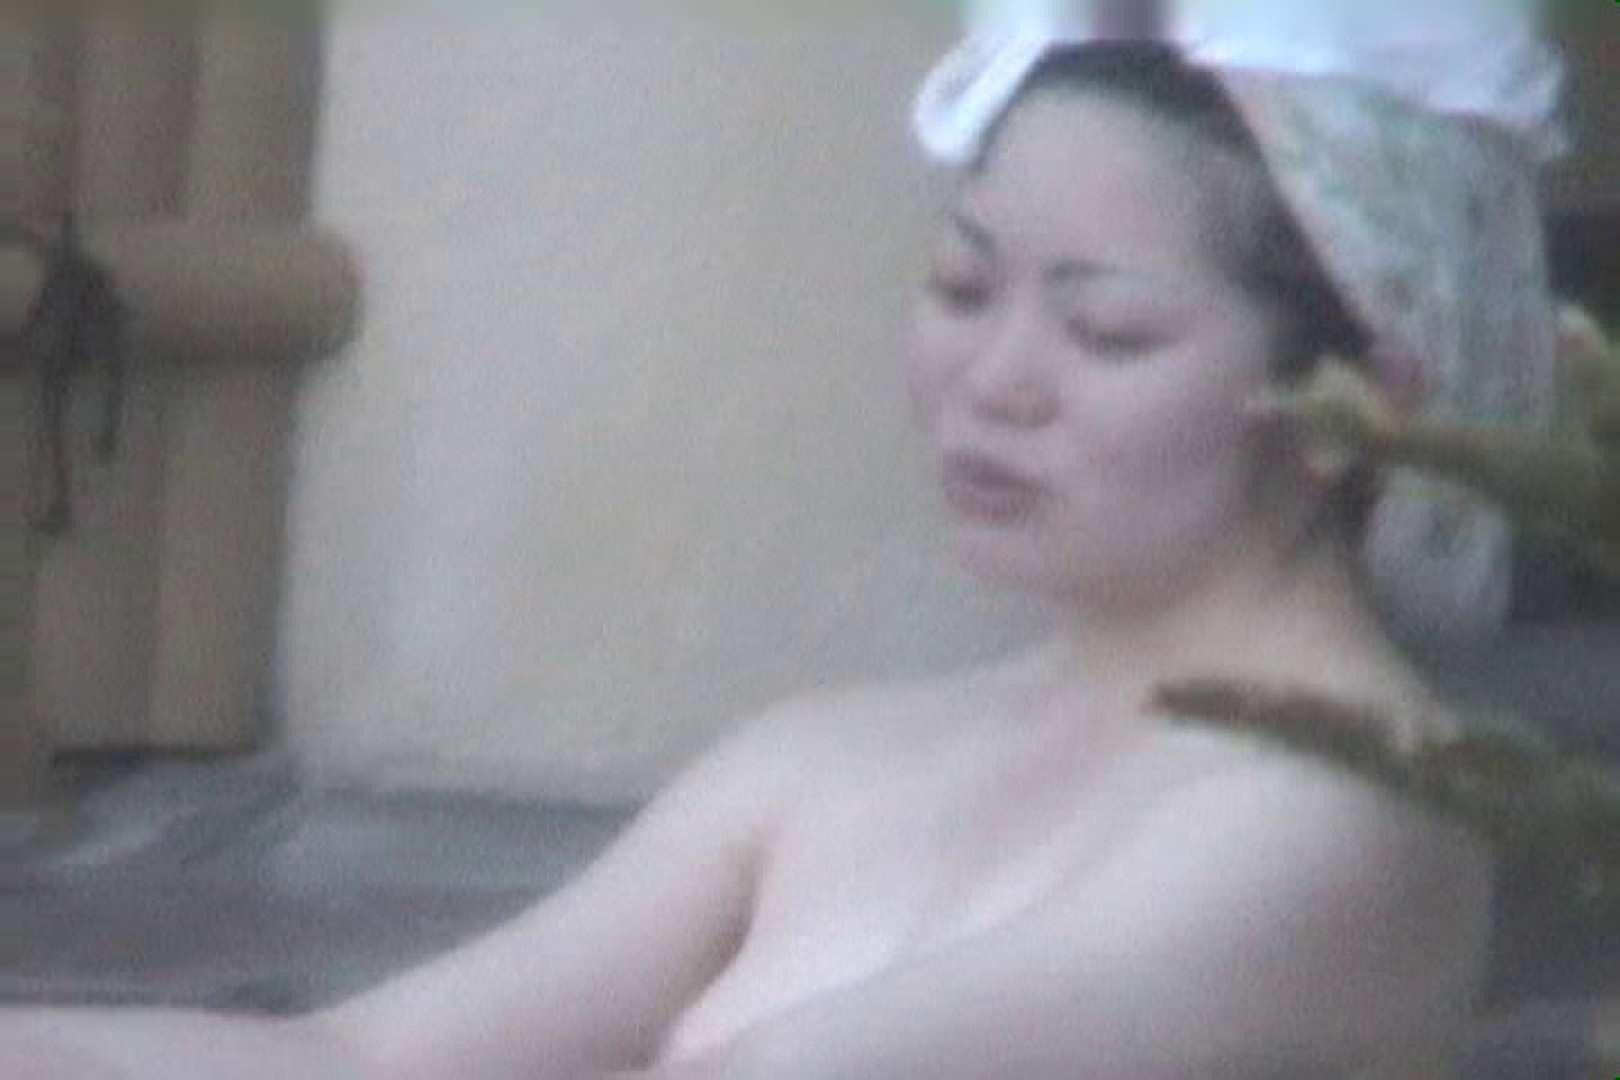 Aquaな露天風呂Vol.86【VIP限定】 OLのエロ生活 オマンコ無修正動画無料 96連発 89